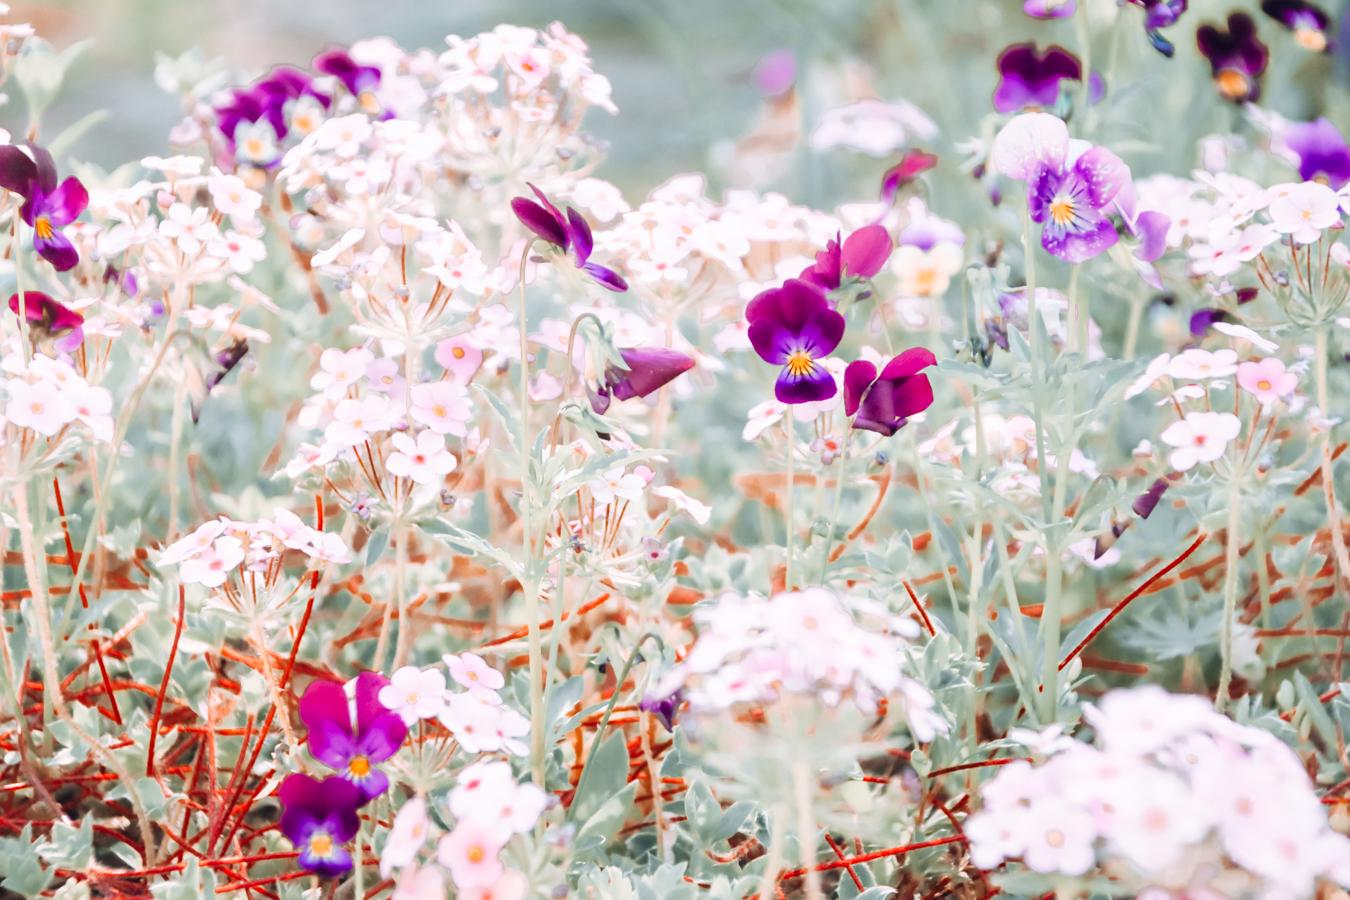 Flowers at Reader Rock Garden